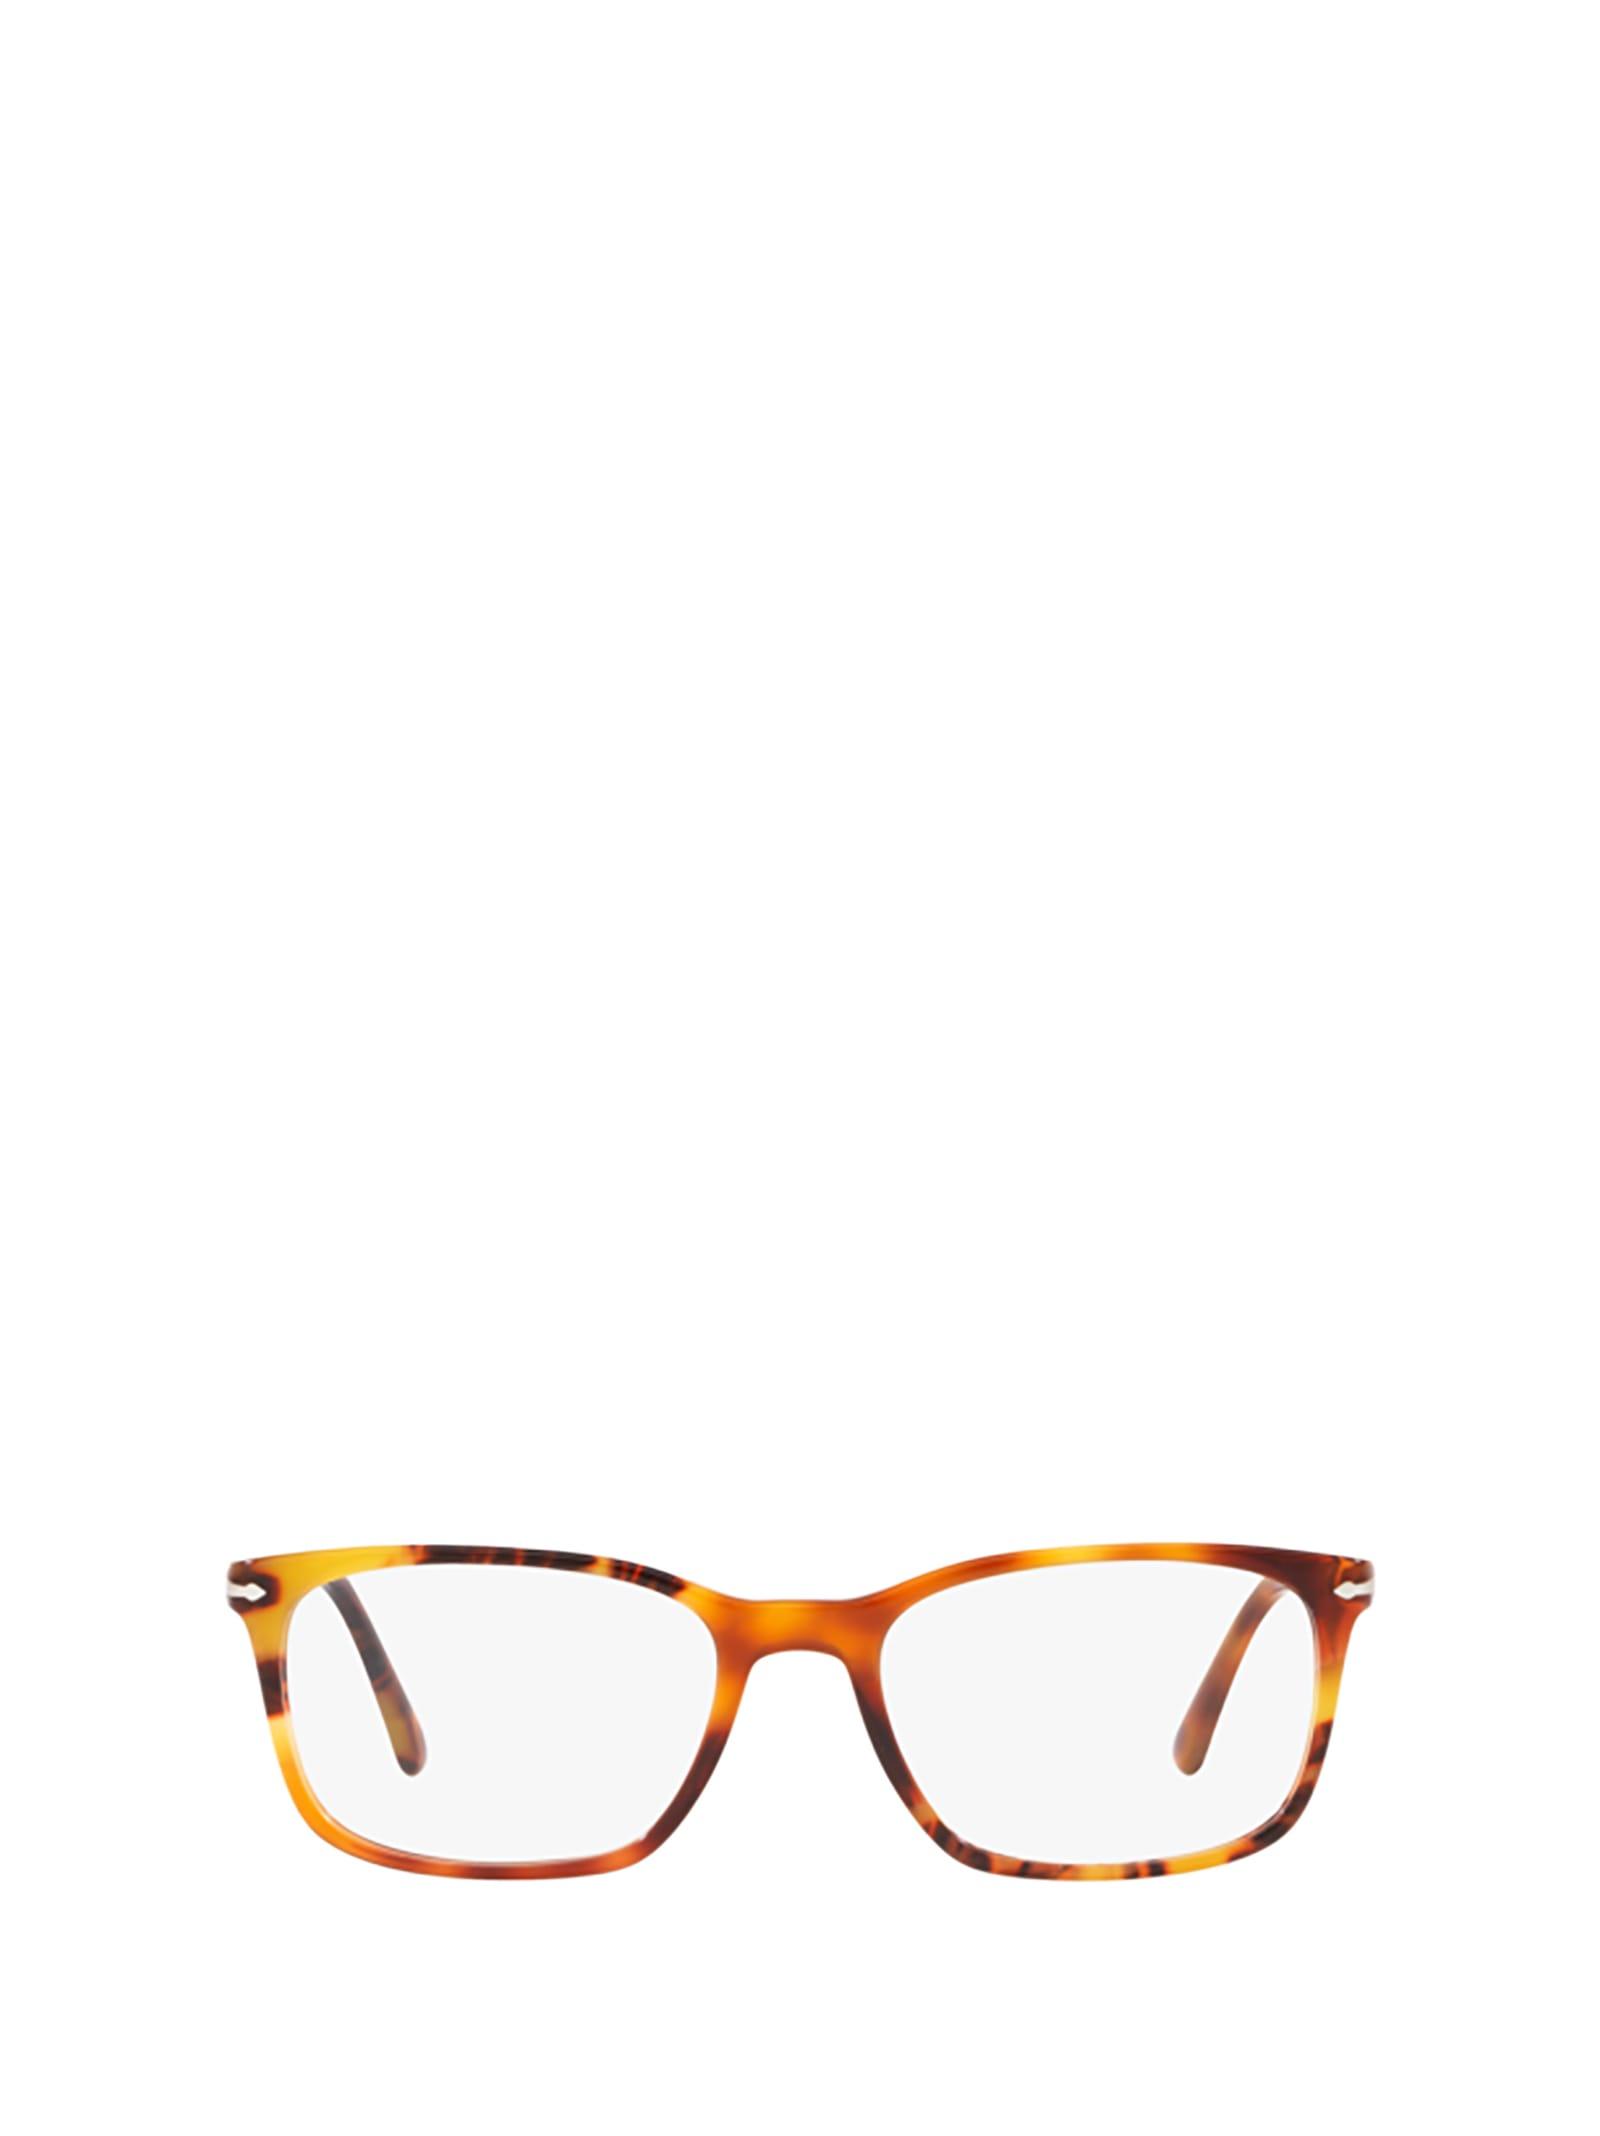 Persol Persol Po3189v Brown Tortoise Glasses